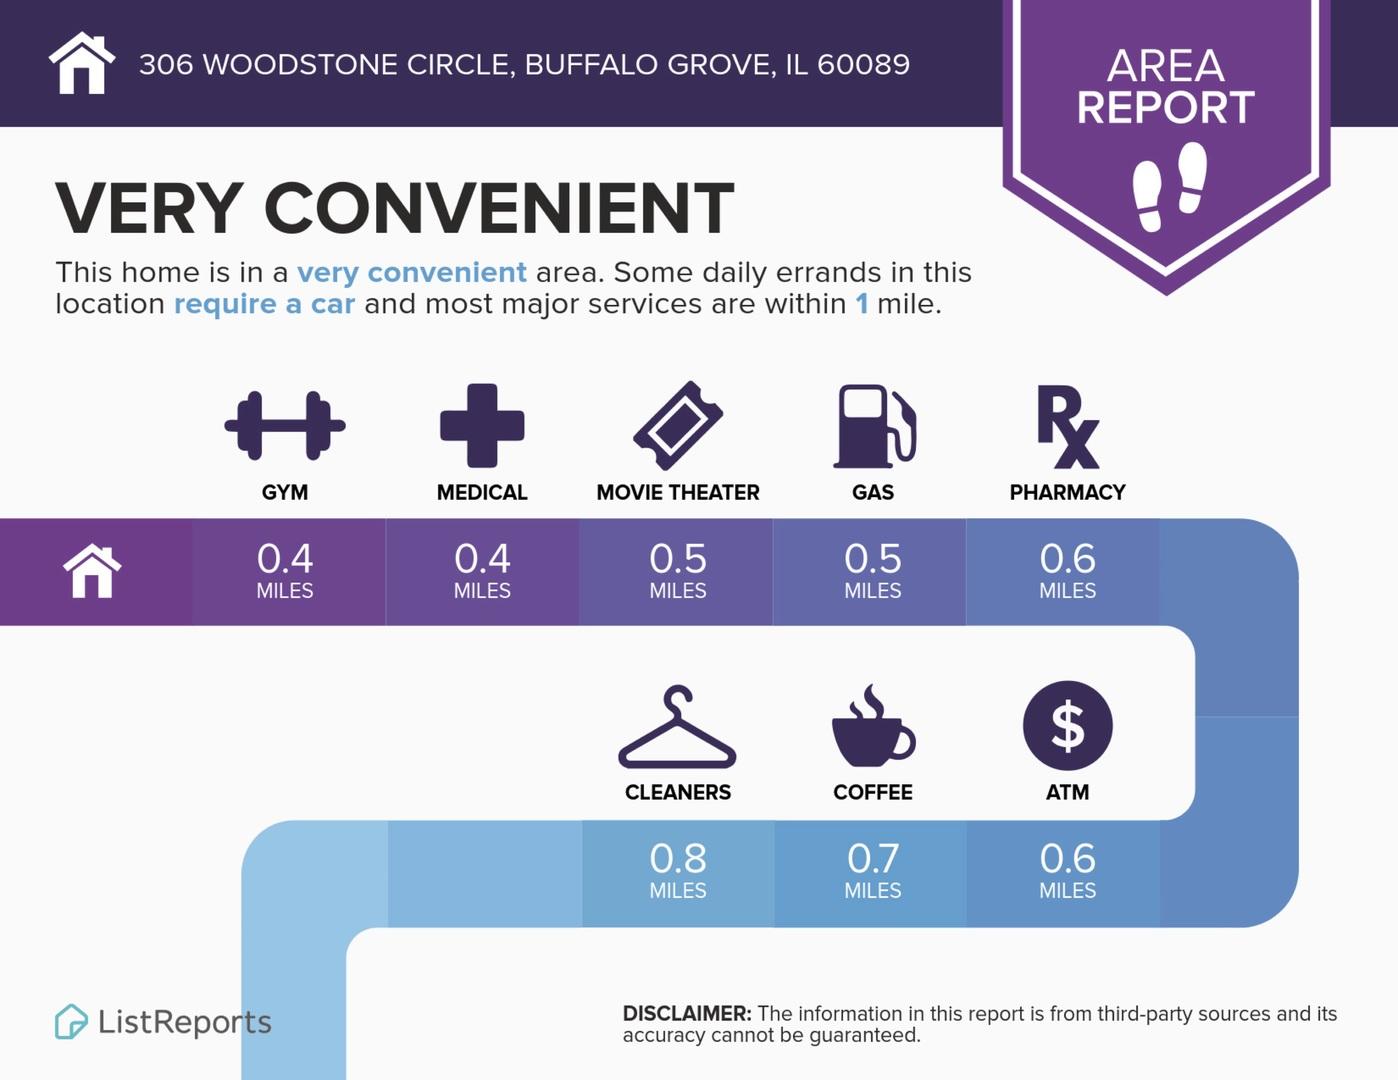 306 Woodstone Circle